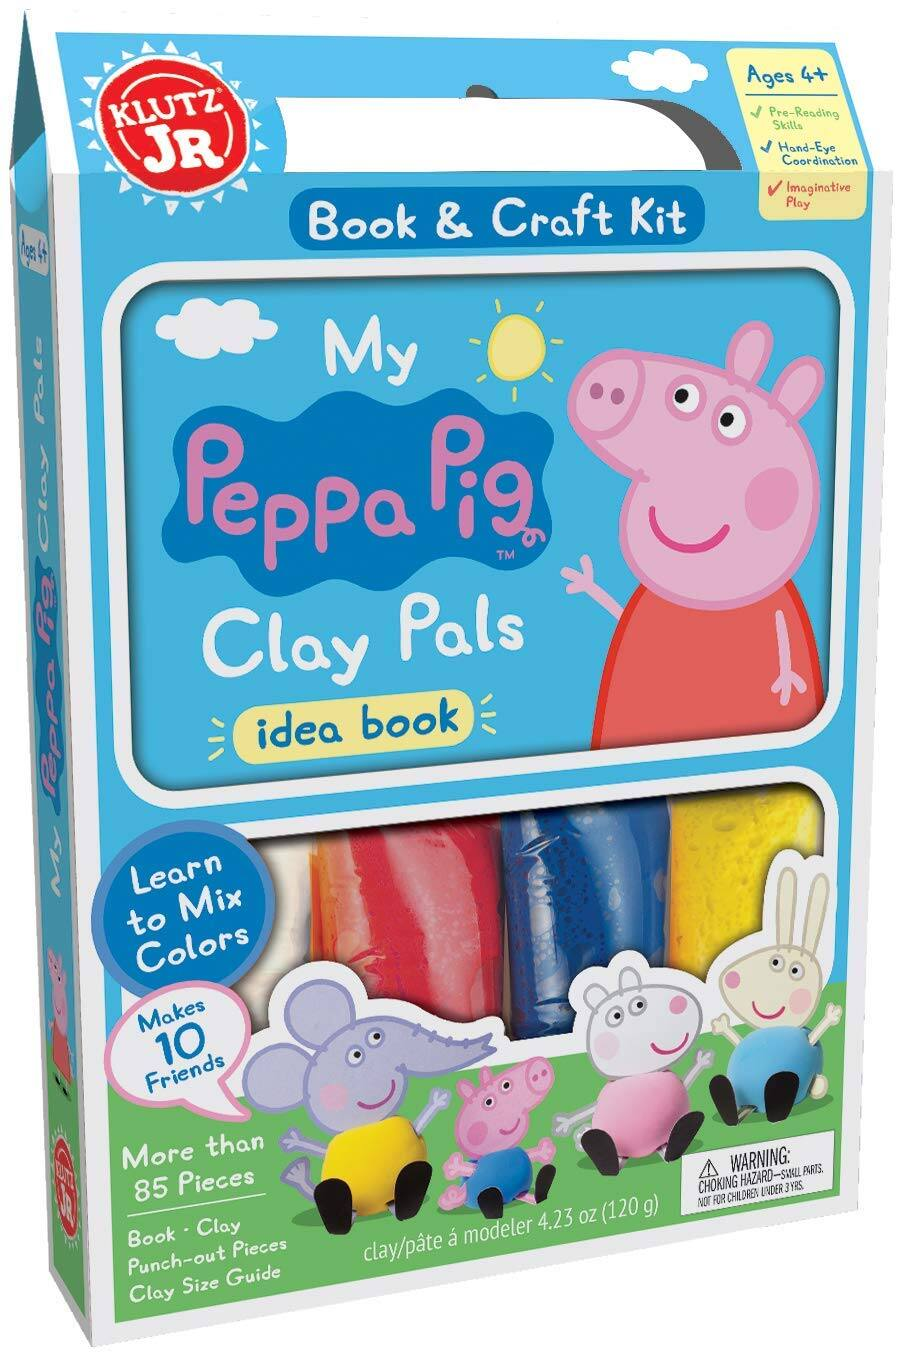 Klutz Jr. My Peppa Pig Clay Pals Craft Kit $4.61 - Amazon